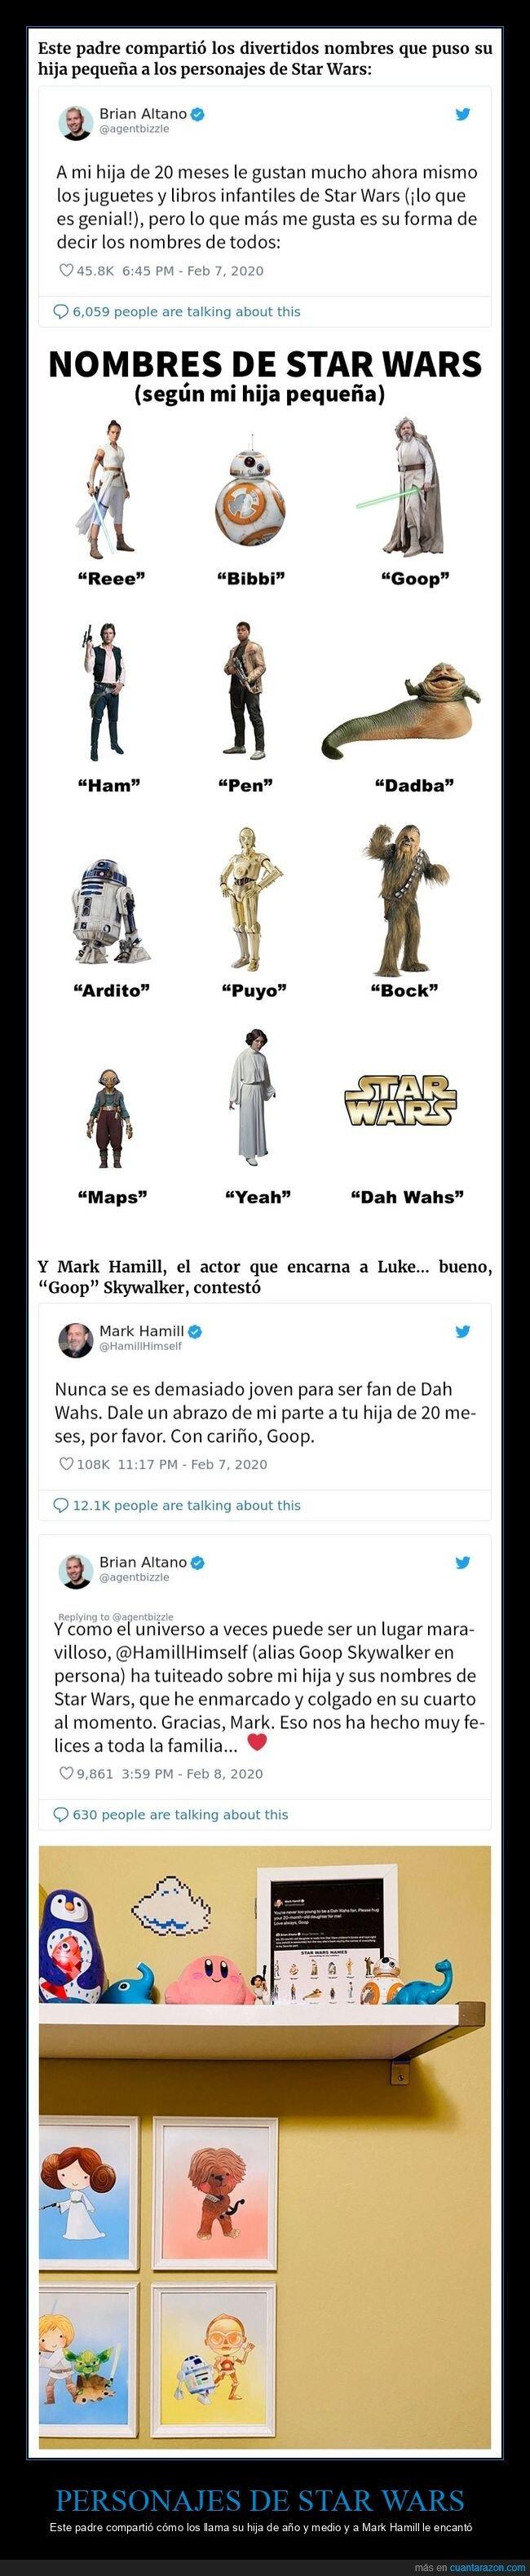 mark hamill,niña.padre,nombres,personajes,star wars